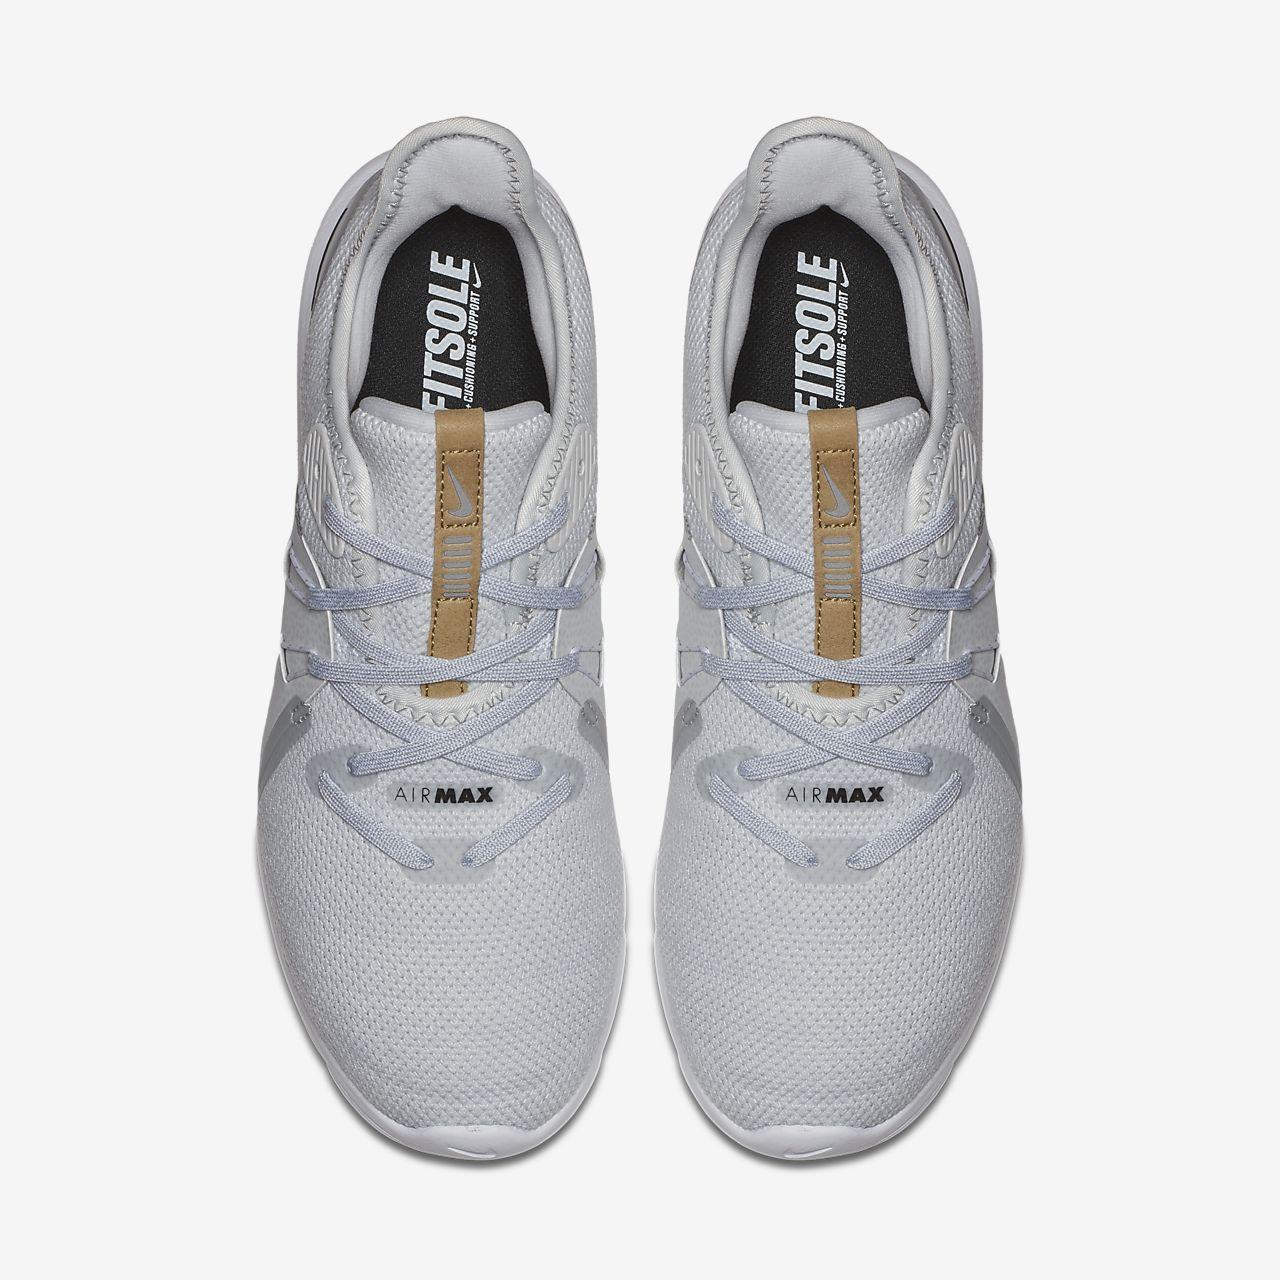 big sale 16dc3 b0450 ... Chaussure Nike Air Max Sequent 3 pour Femme